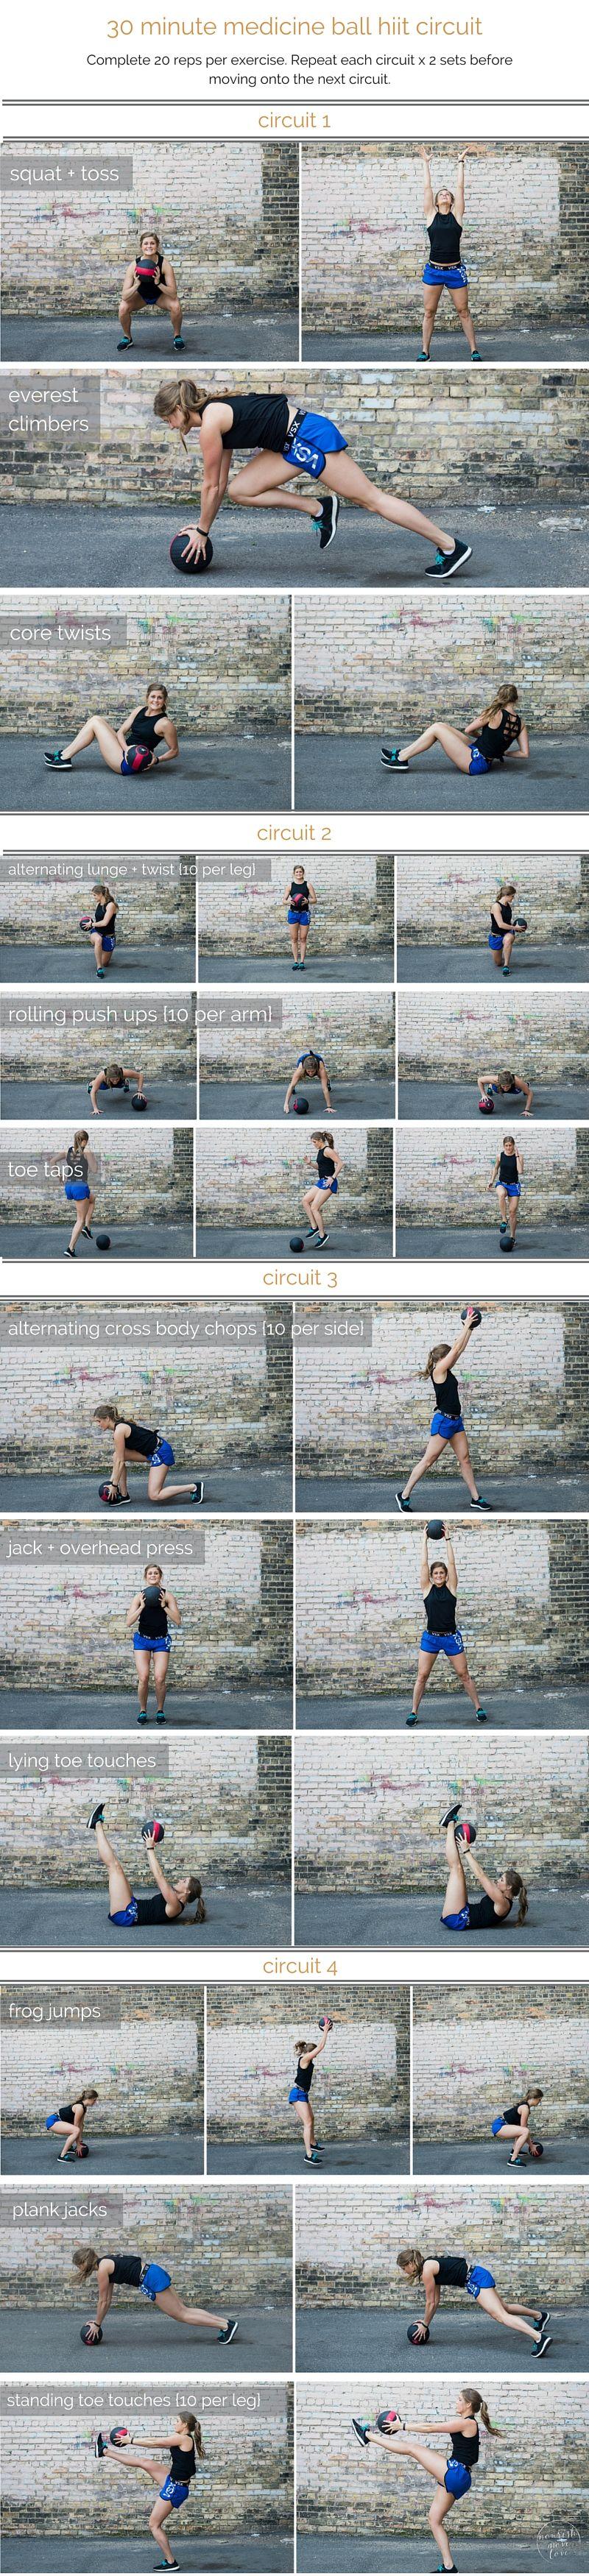 Hanging knee raises with medicine ball - Medicine Ball Hiit Circuit Workout